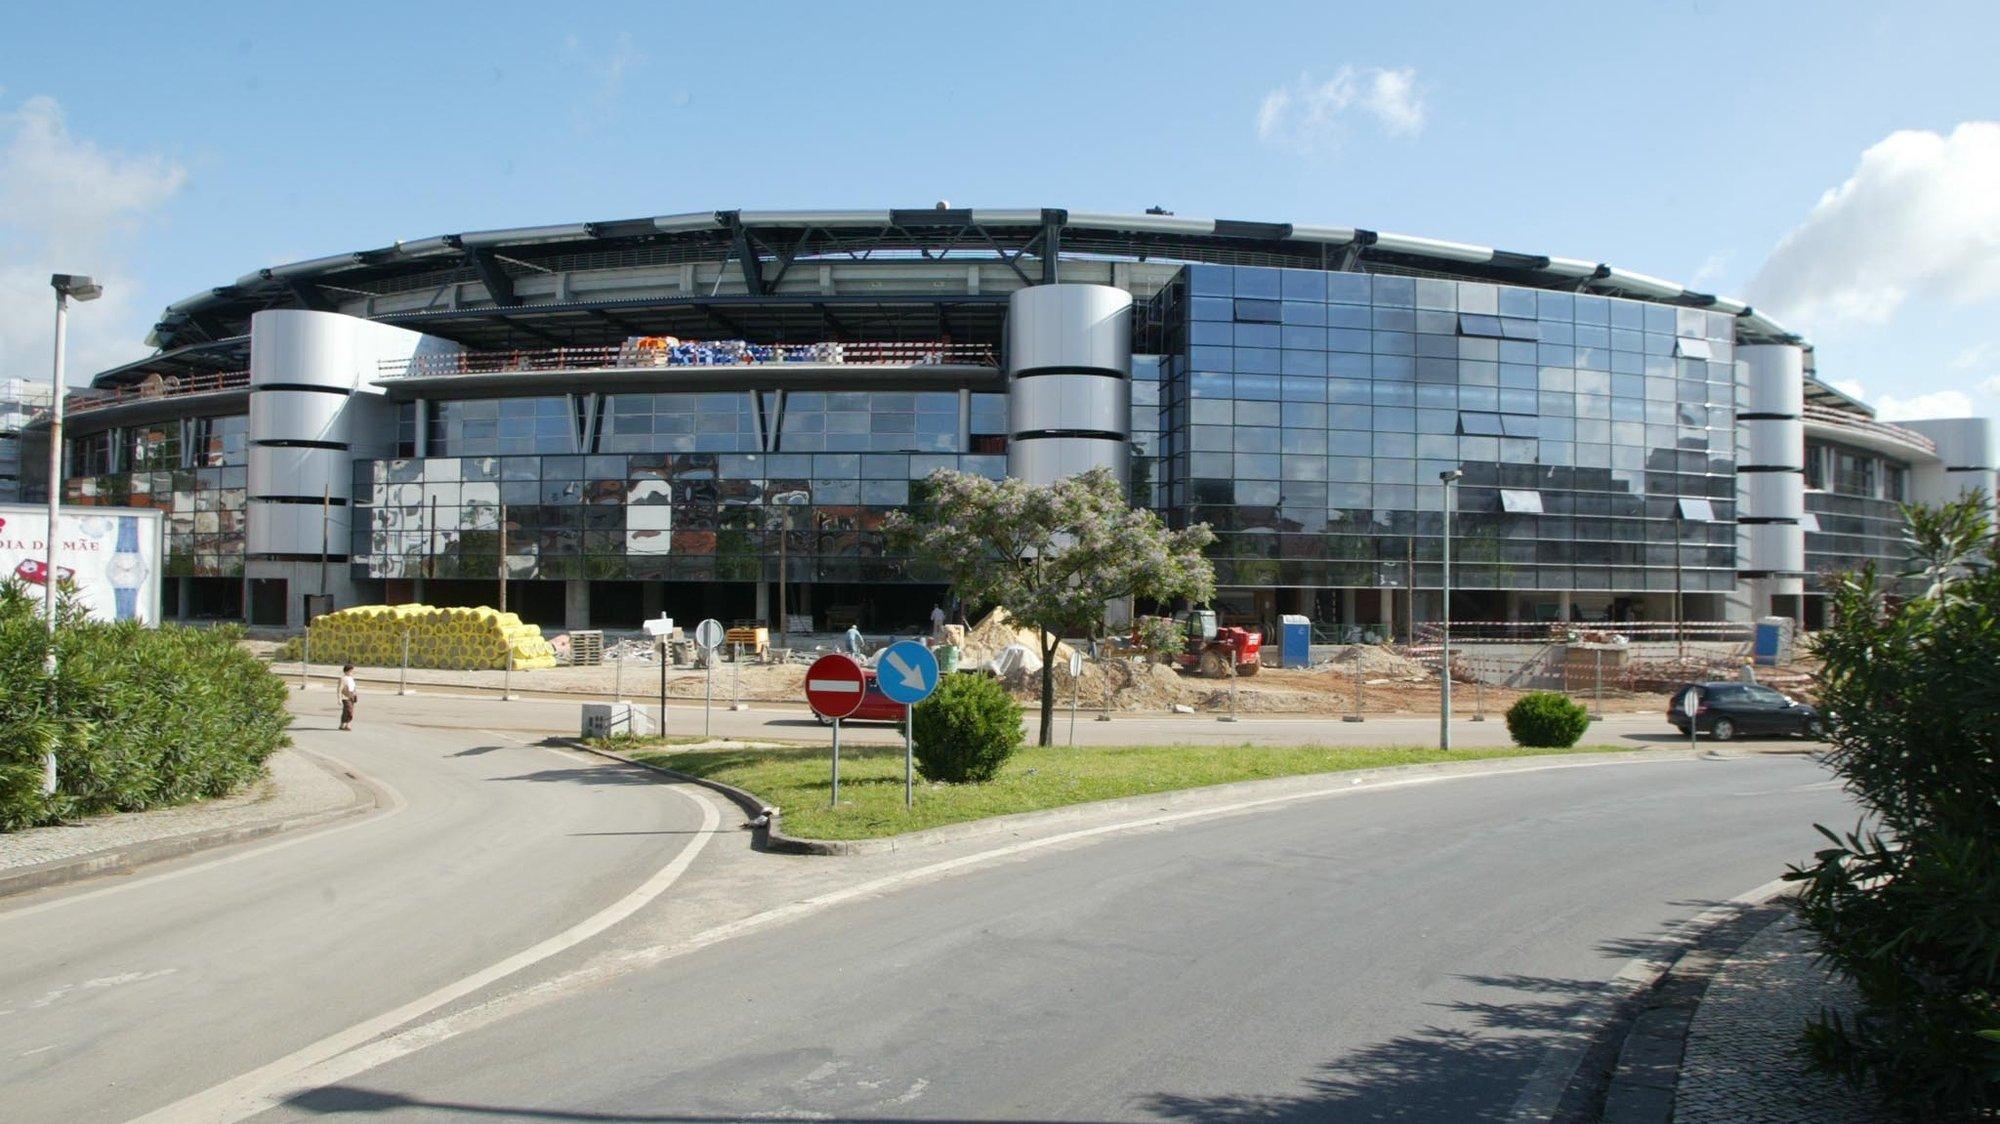 EST02:20030506:COIMBRA: Obras de construcao do Estadio Municipal de Coimbra com vista a realizacao do Euro 2004. FOTO PAULO NOVAIS/LUSA